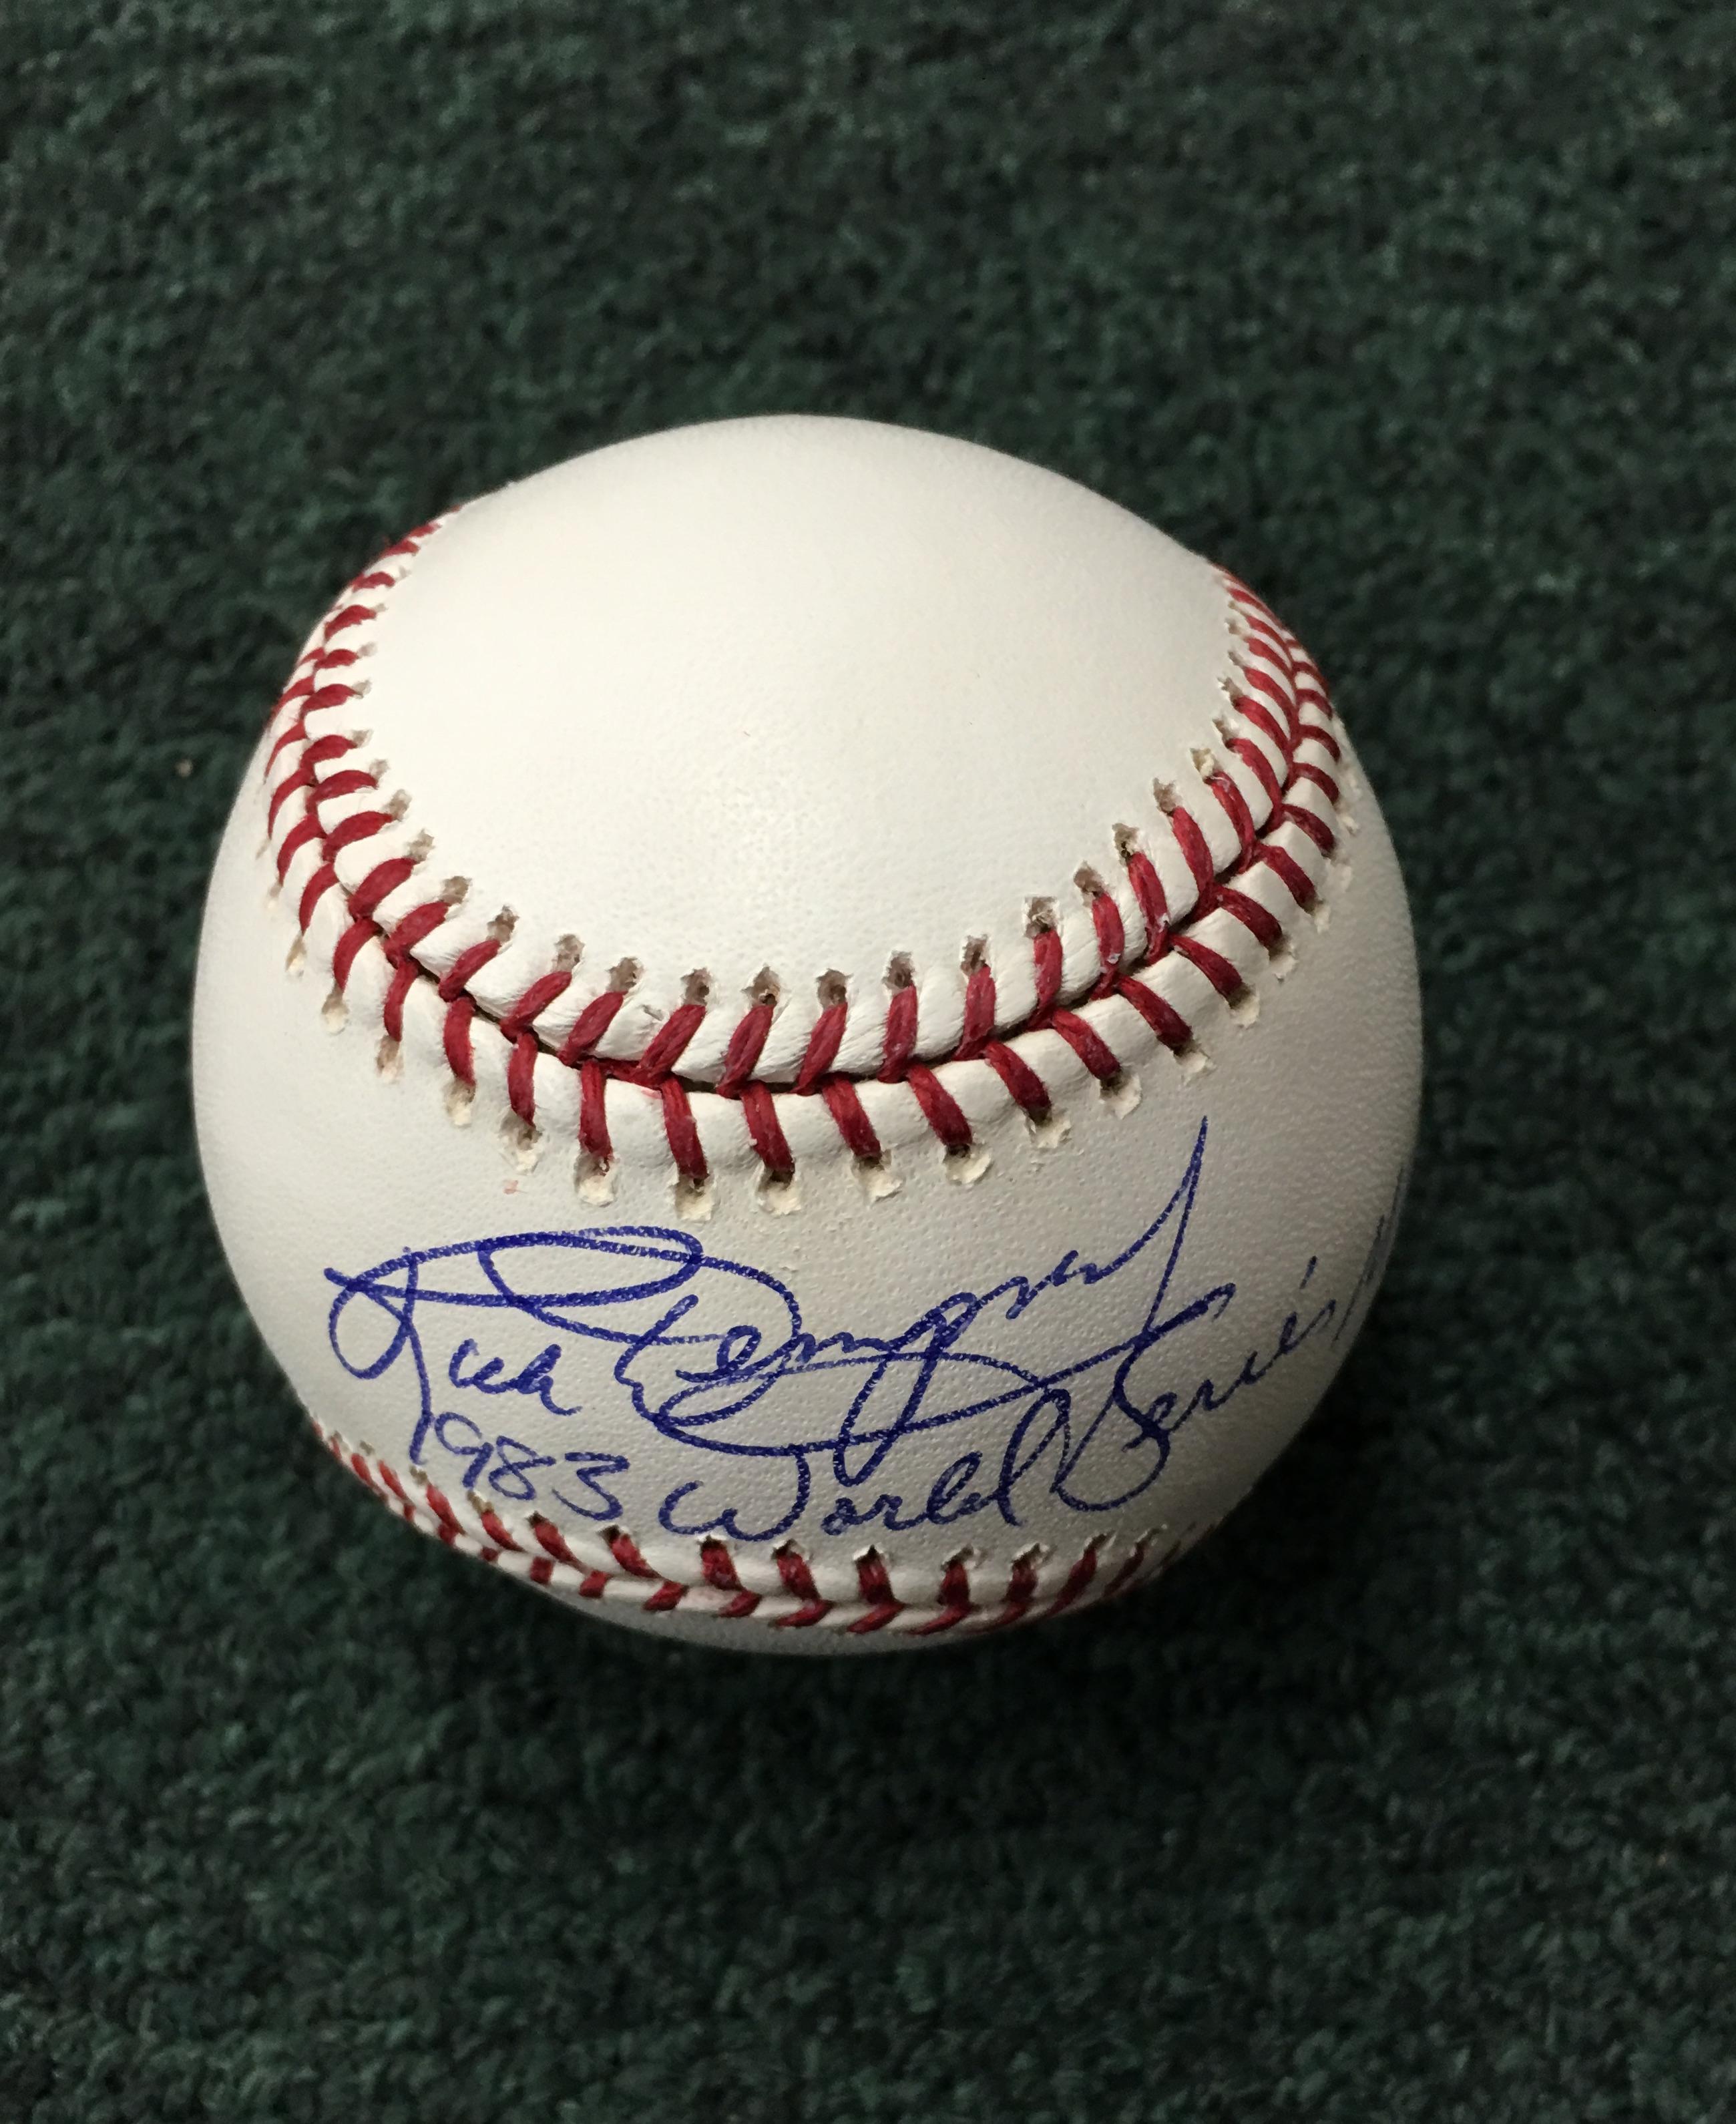 Rick Dempsey autographed baseball